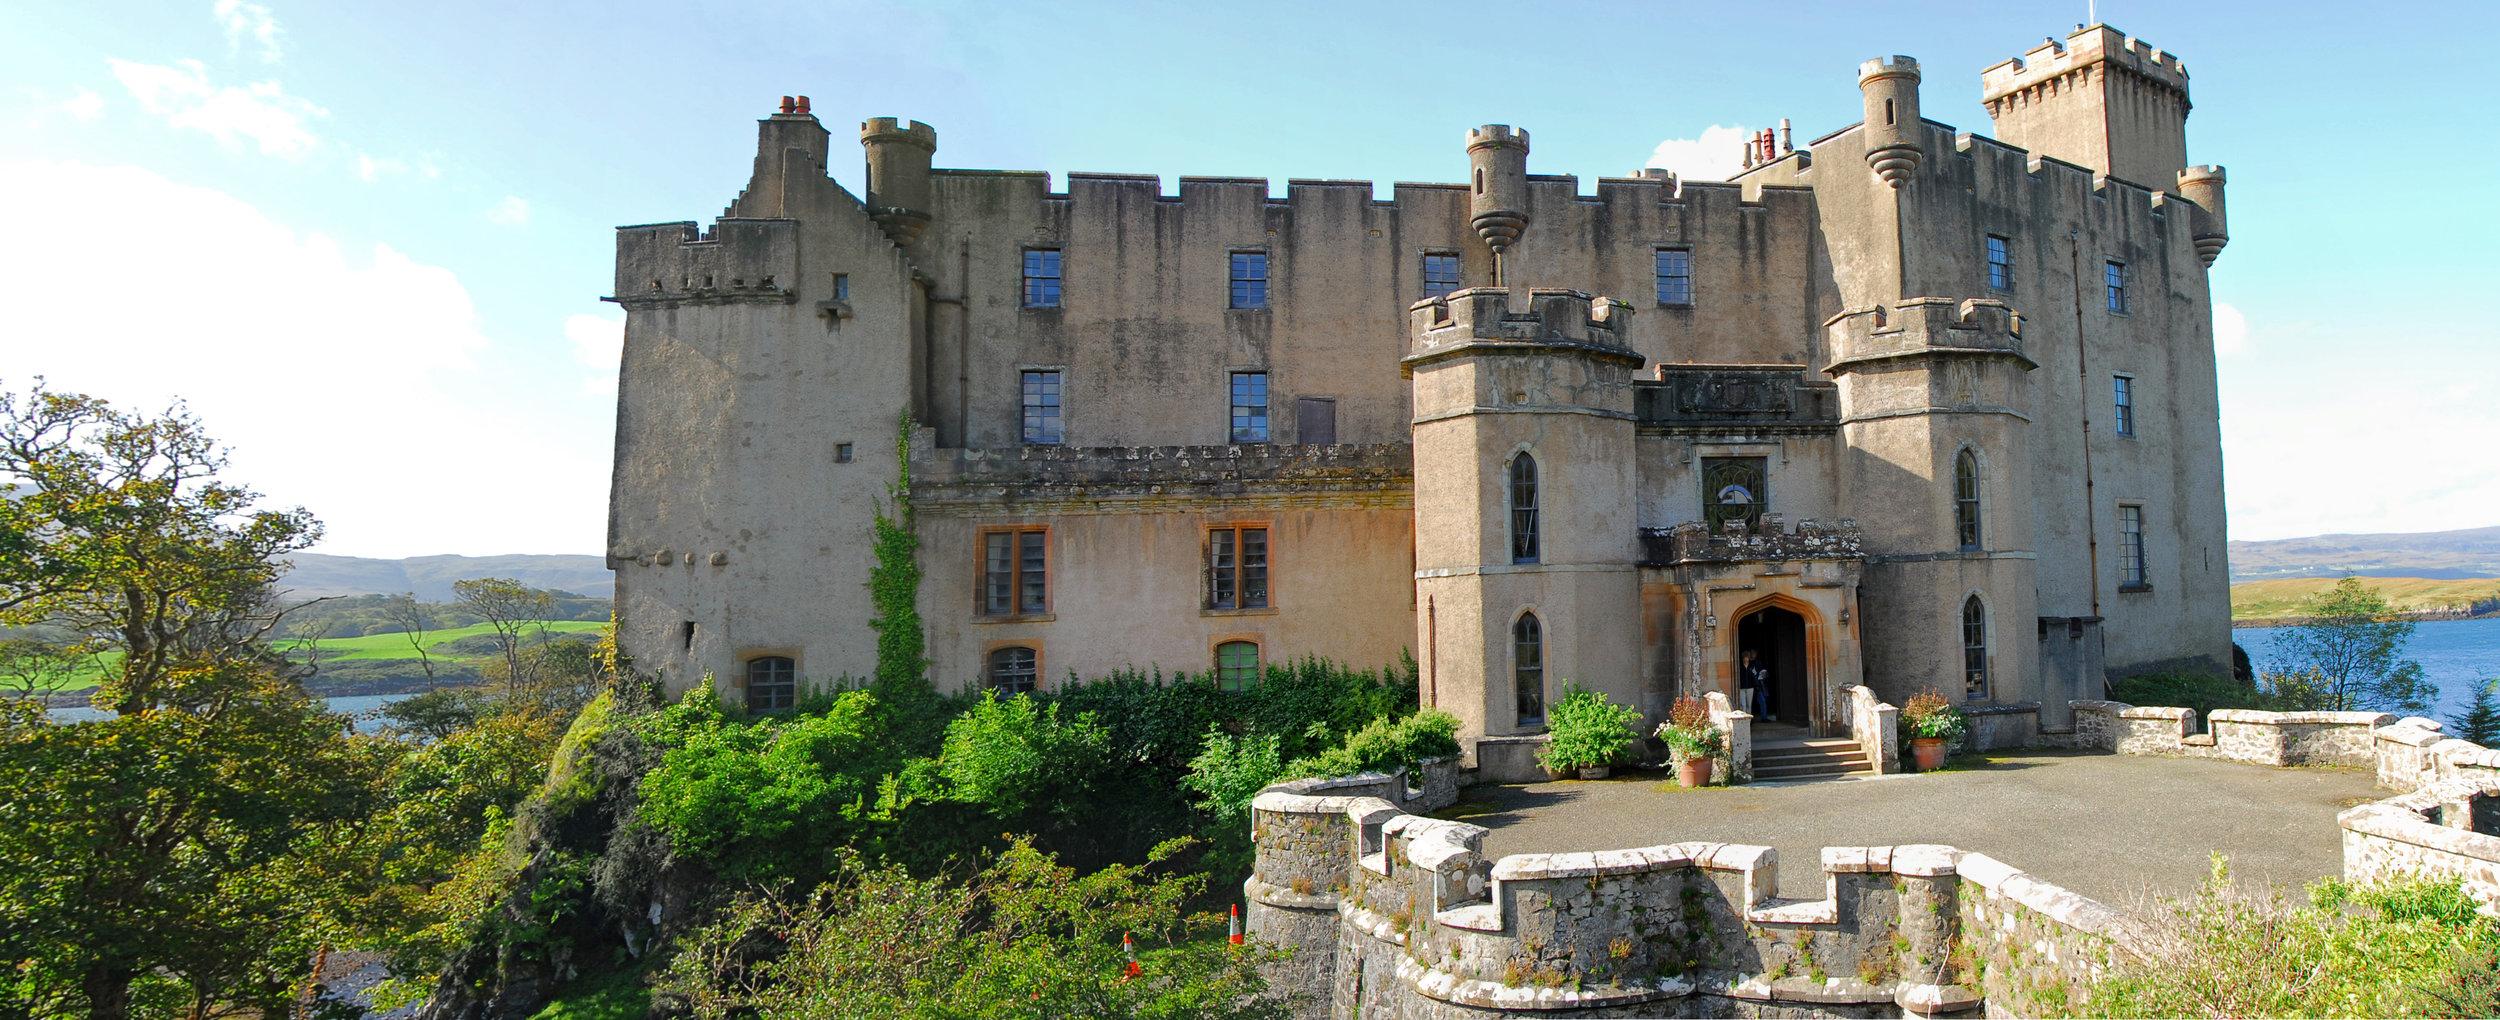 Dunvegan_castle1.jpg